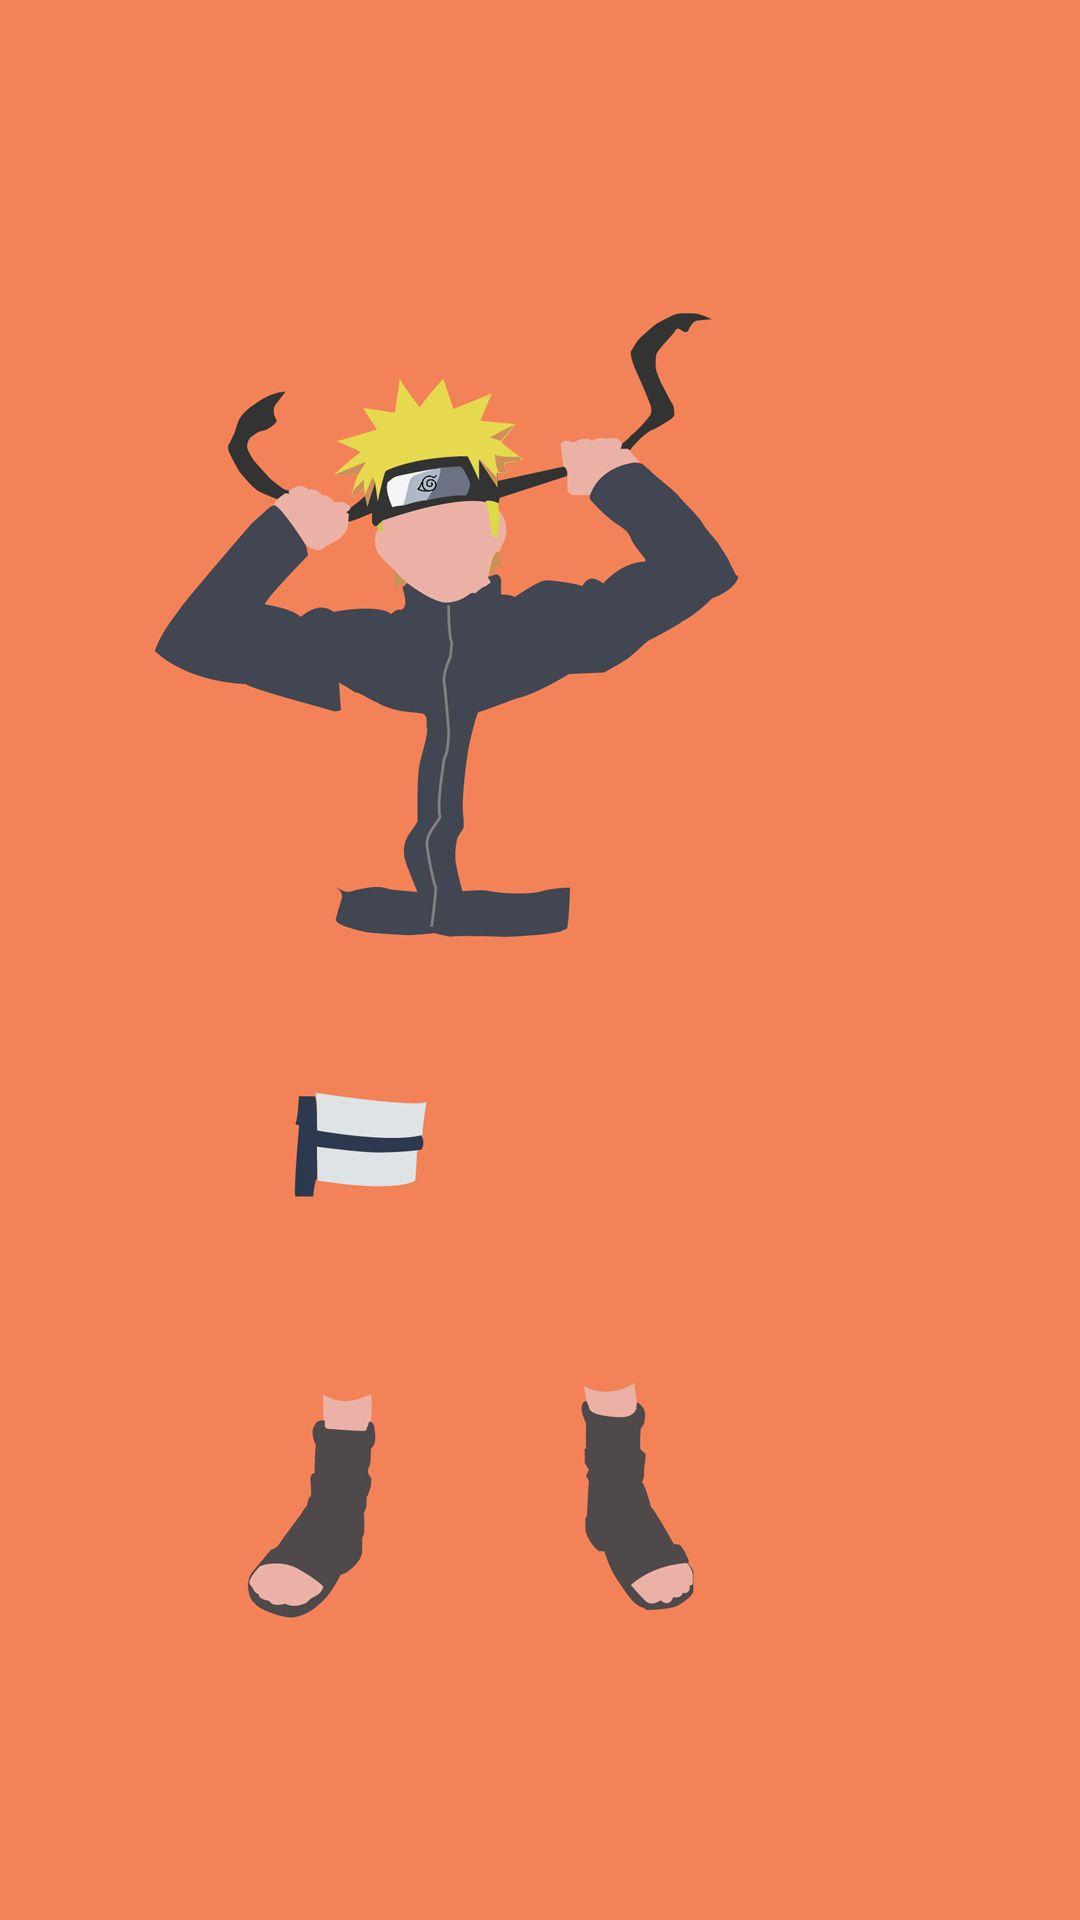 Naruto Uzumaki Minimalist Wallpaper With Images Iphone 6